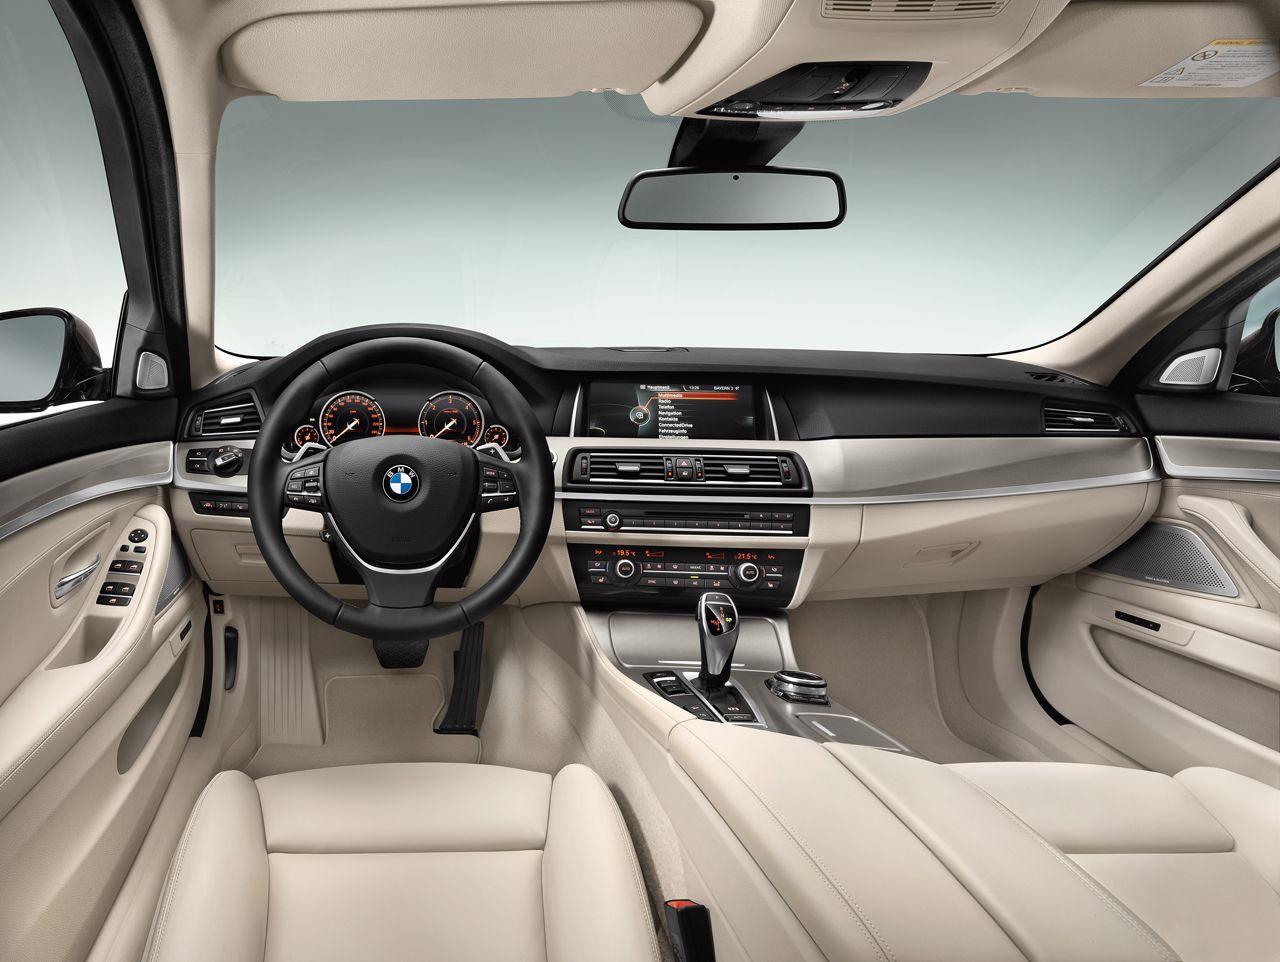 2014 Bmw 5 Series Touring Interior Love Bmw 5 Series Bmw New